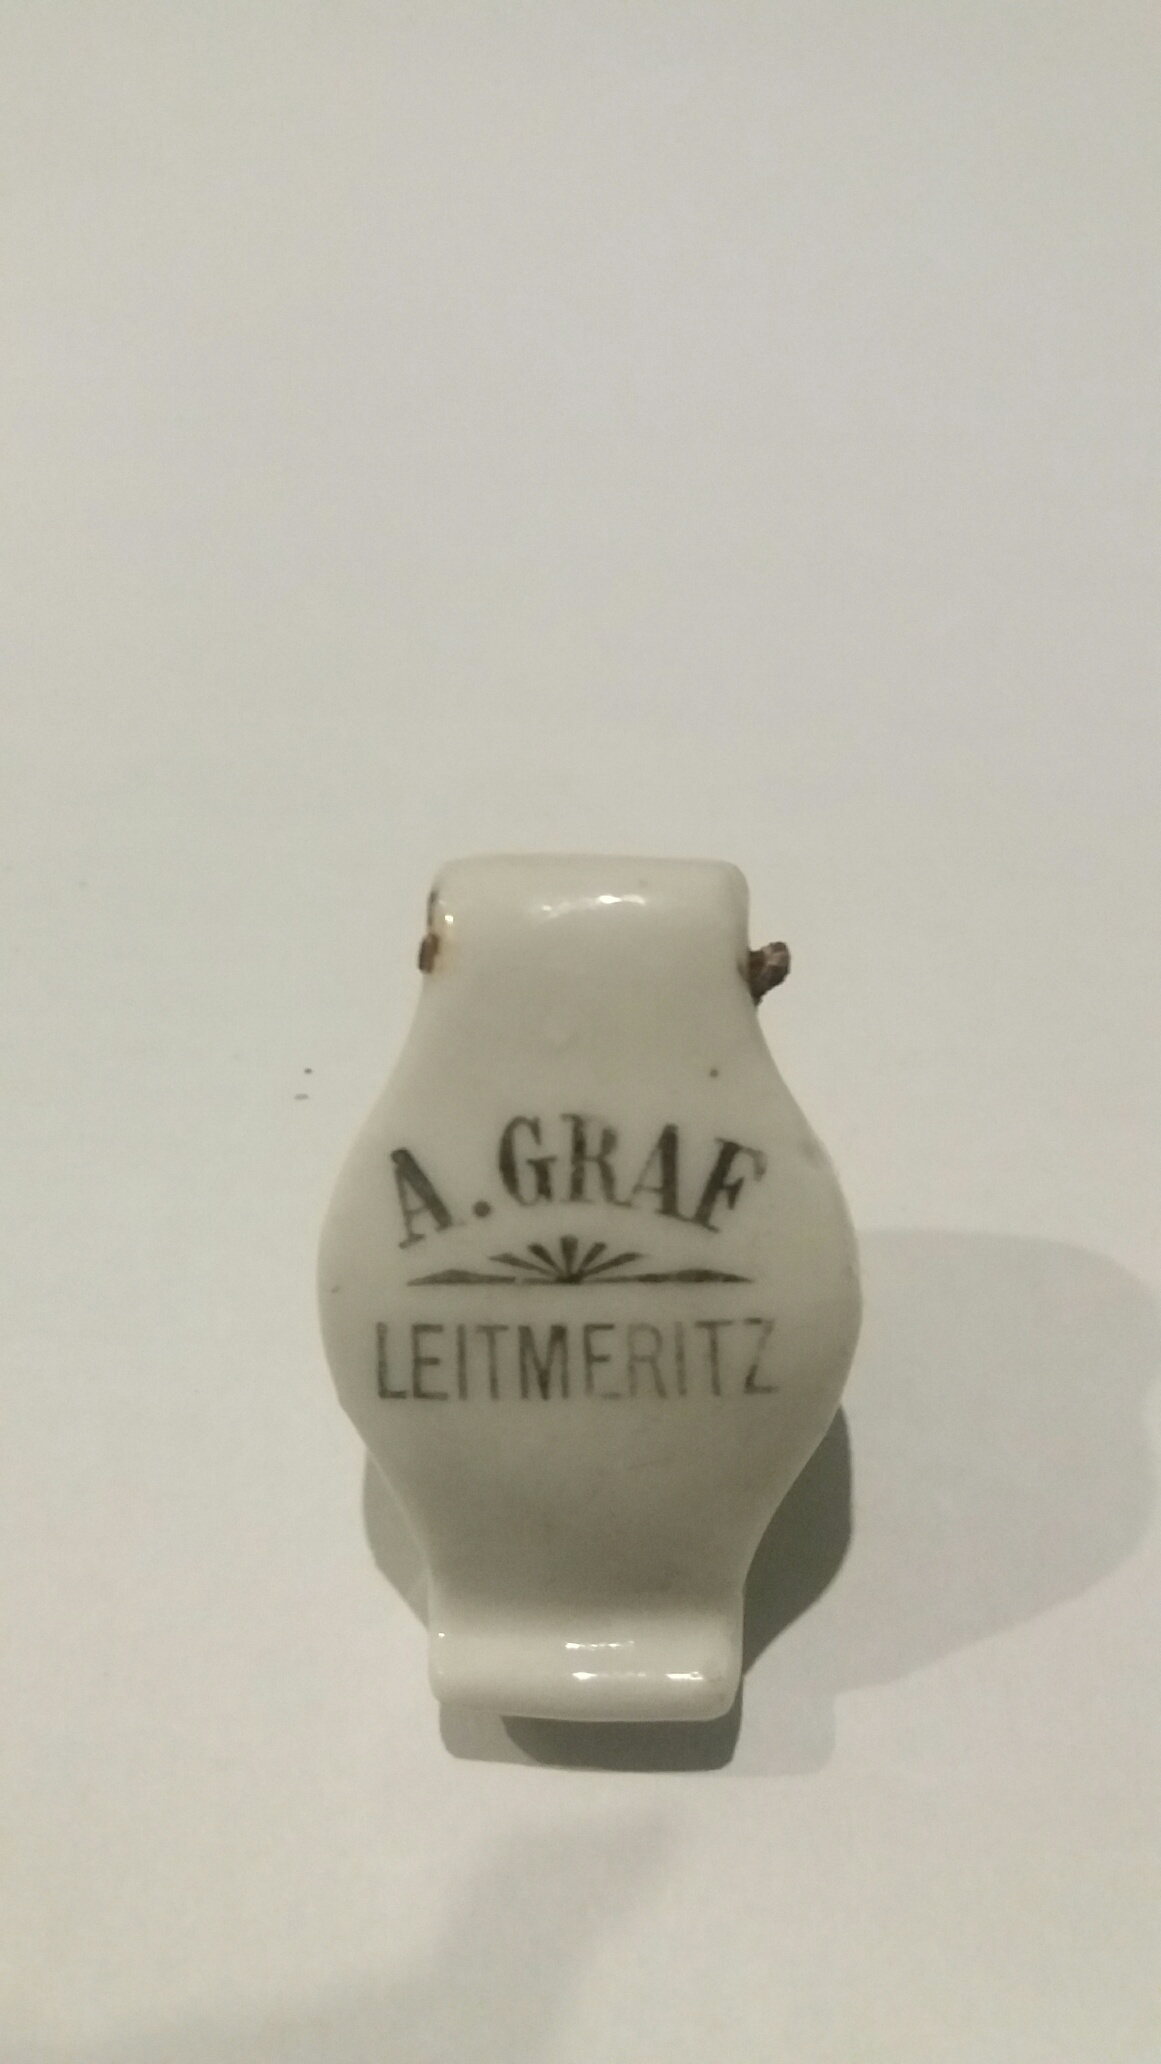 A.Graf Leitmeritz